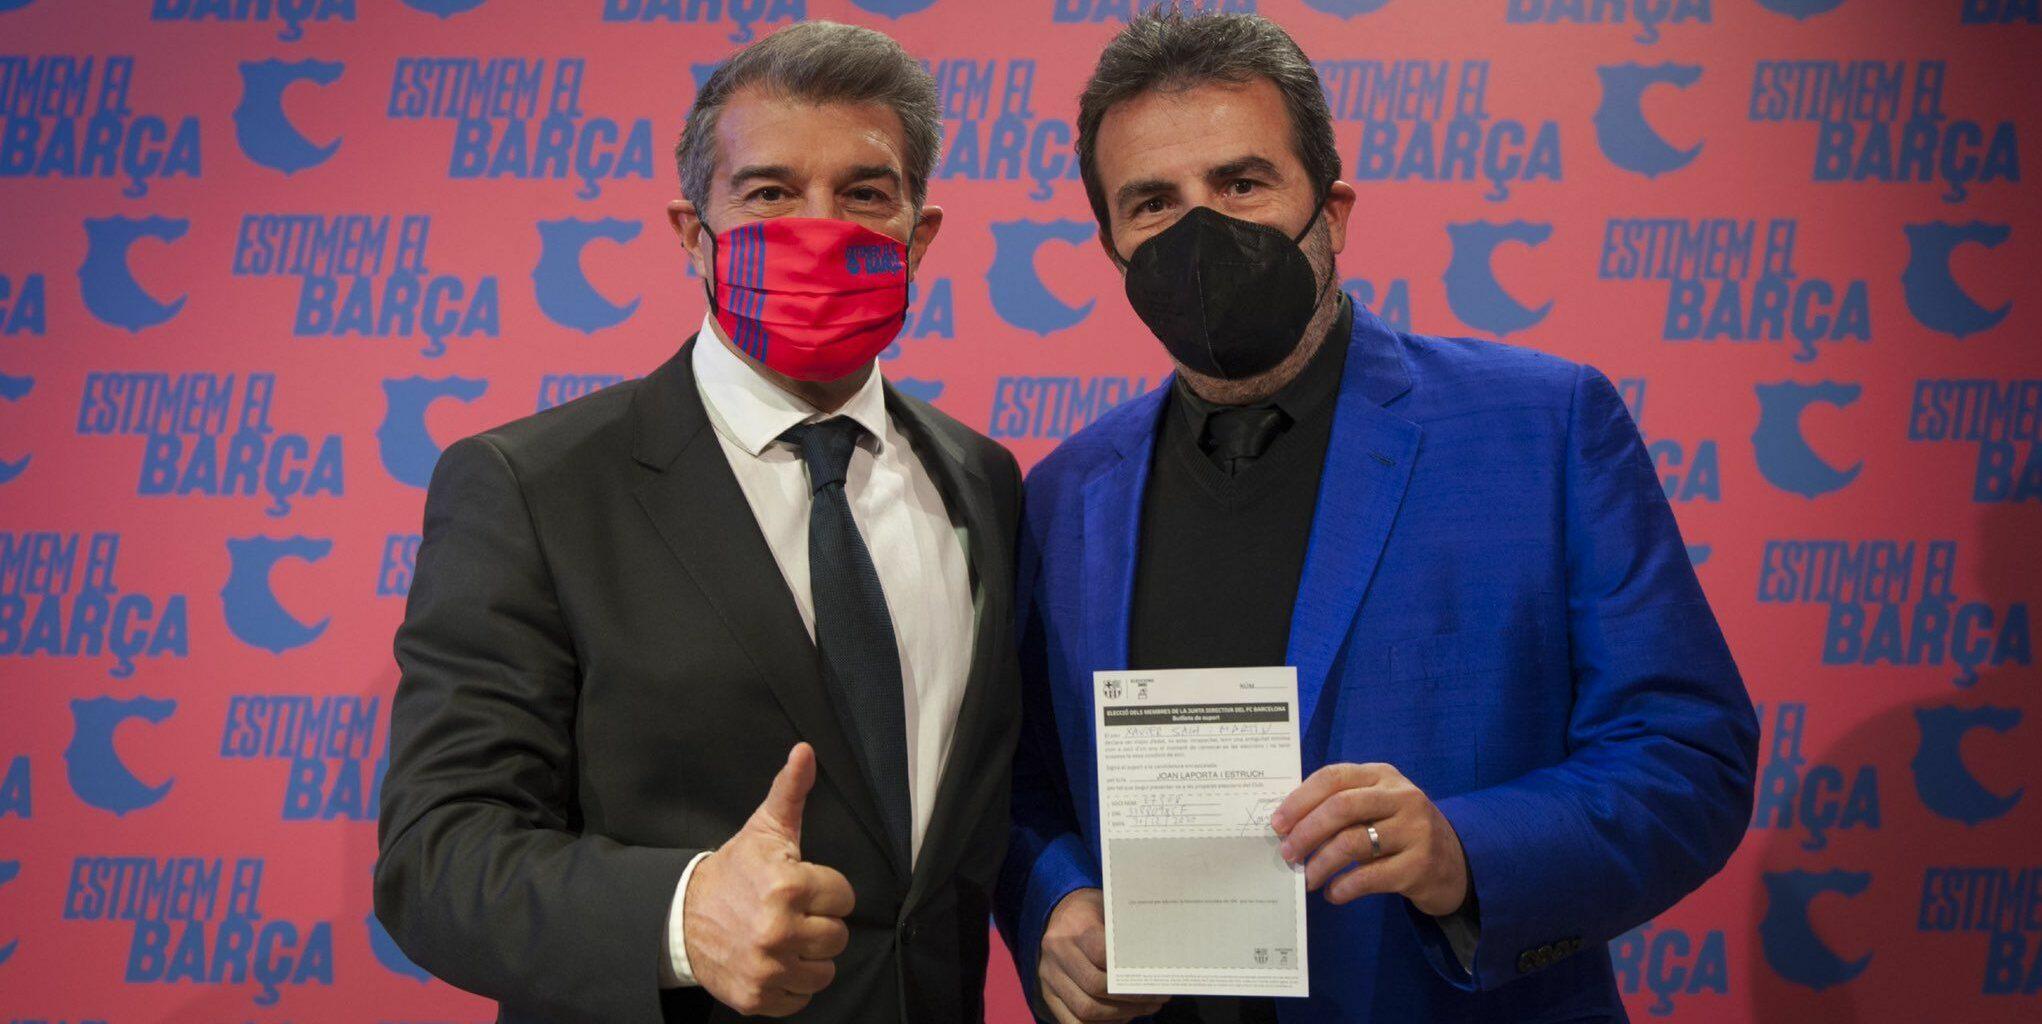 Laporta i Sala-i-Martin, amb una papereta | @JoanLaportaFCB